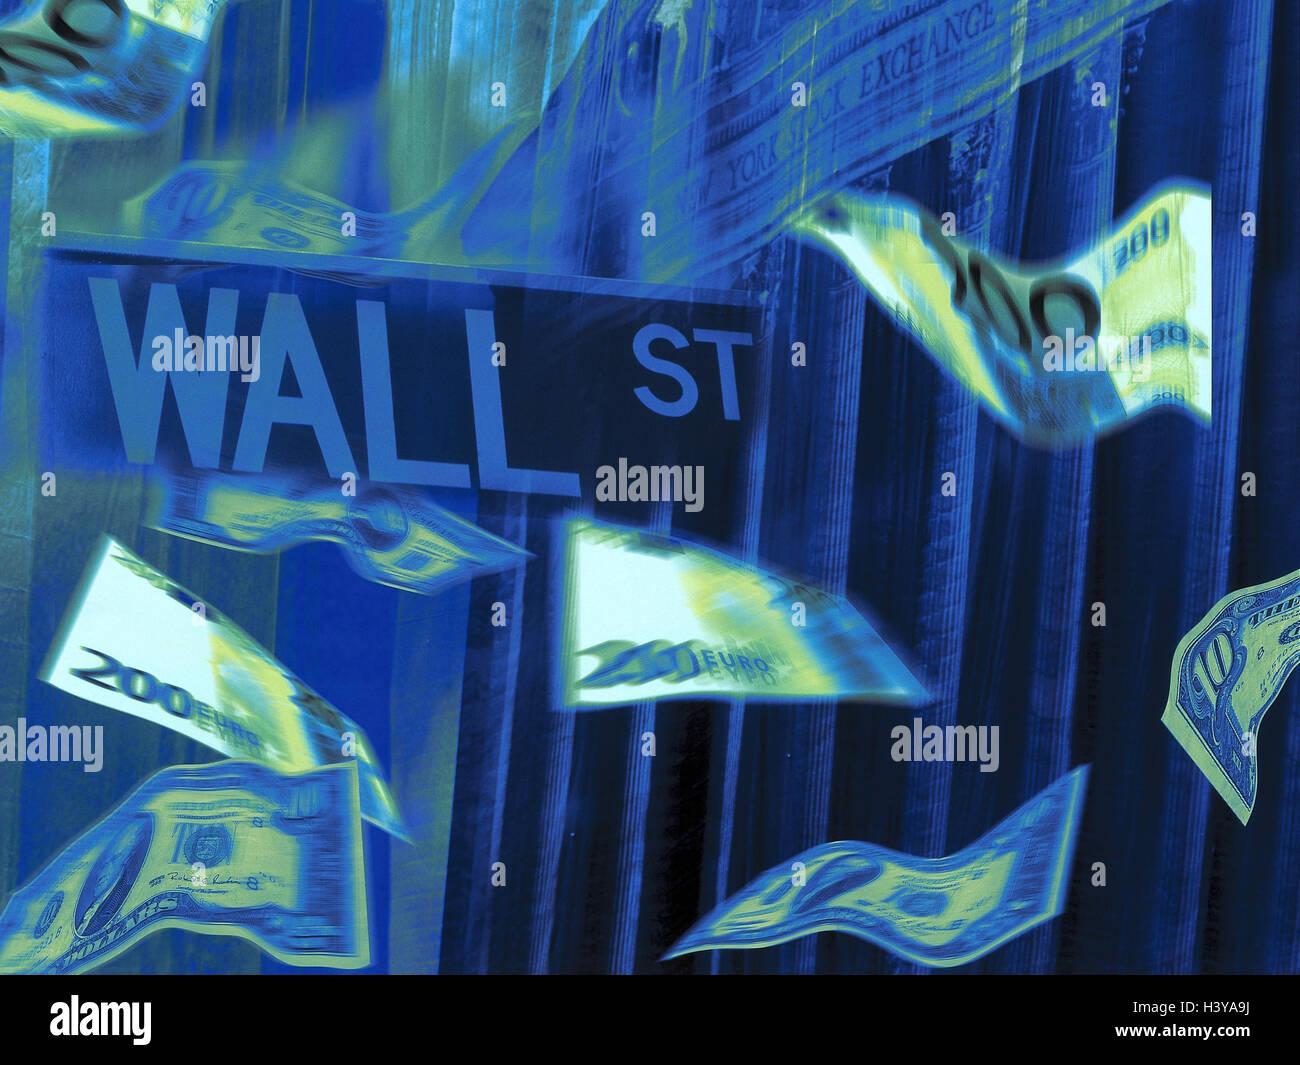 Composing the usa new york stock exchange wall street bank